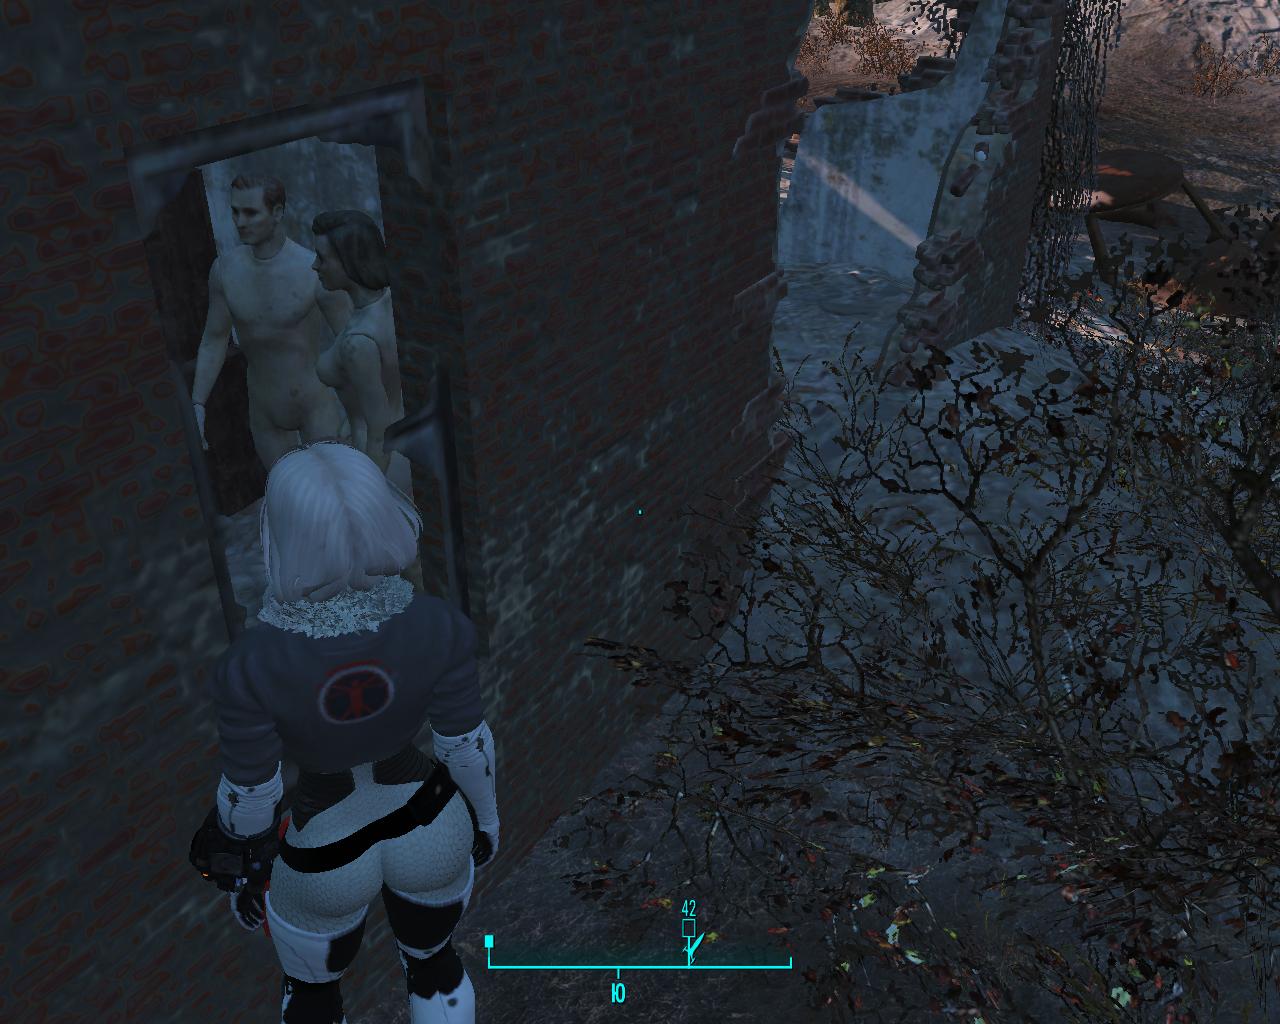 Хелоу - Fallout 4